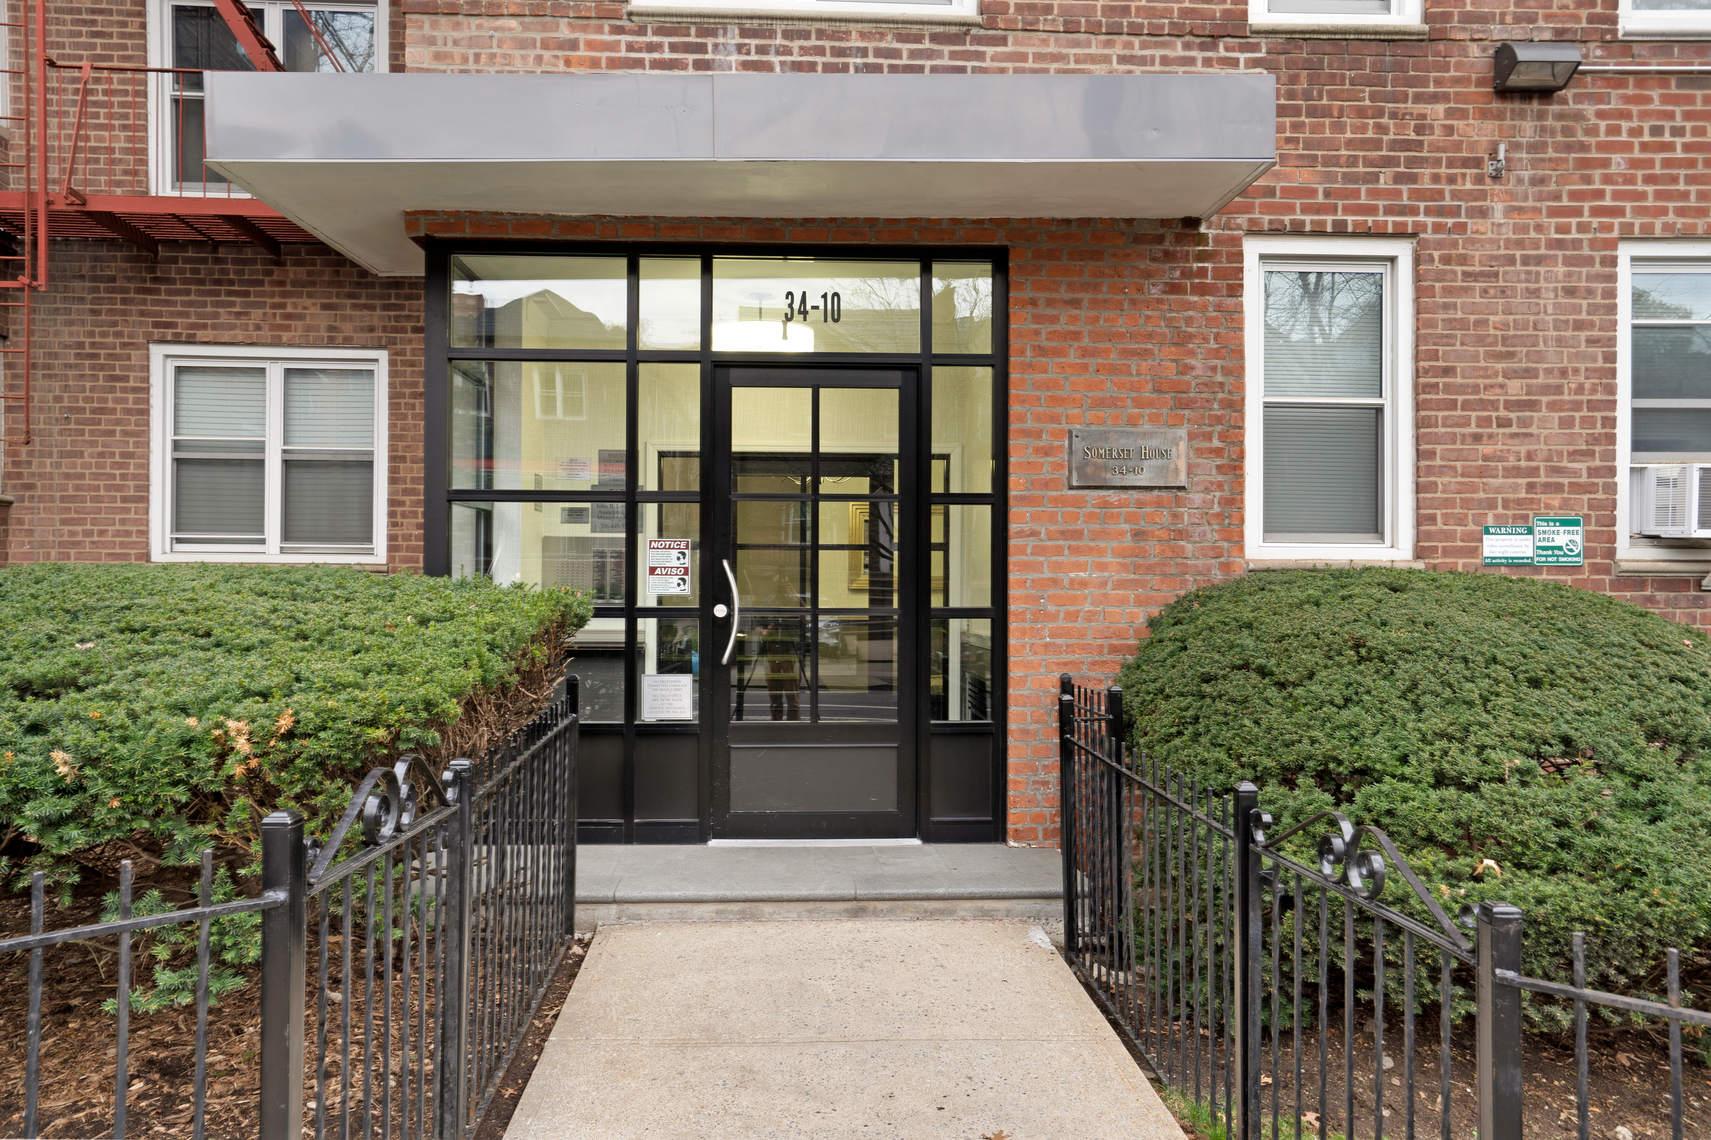 34-10 75th Street, Unit 1H photo